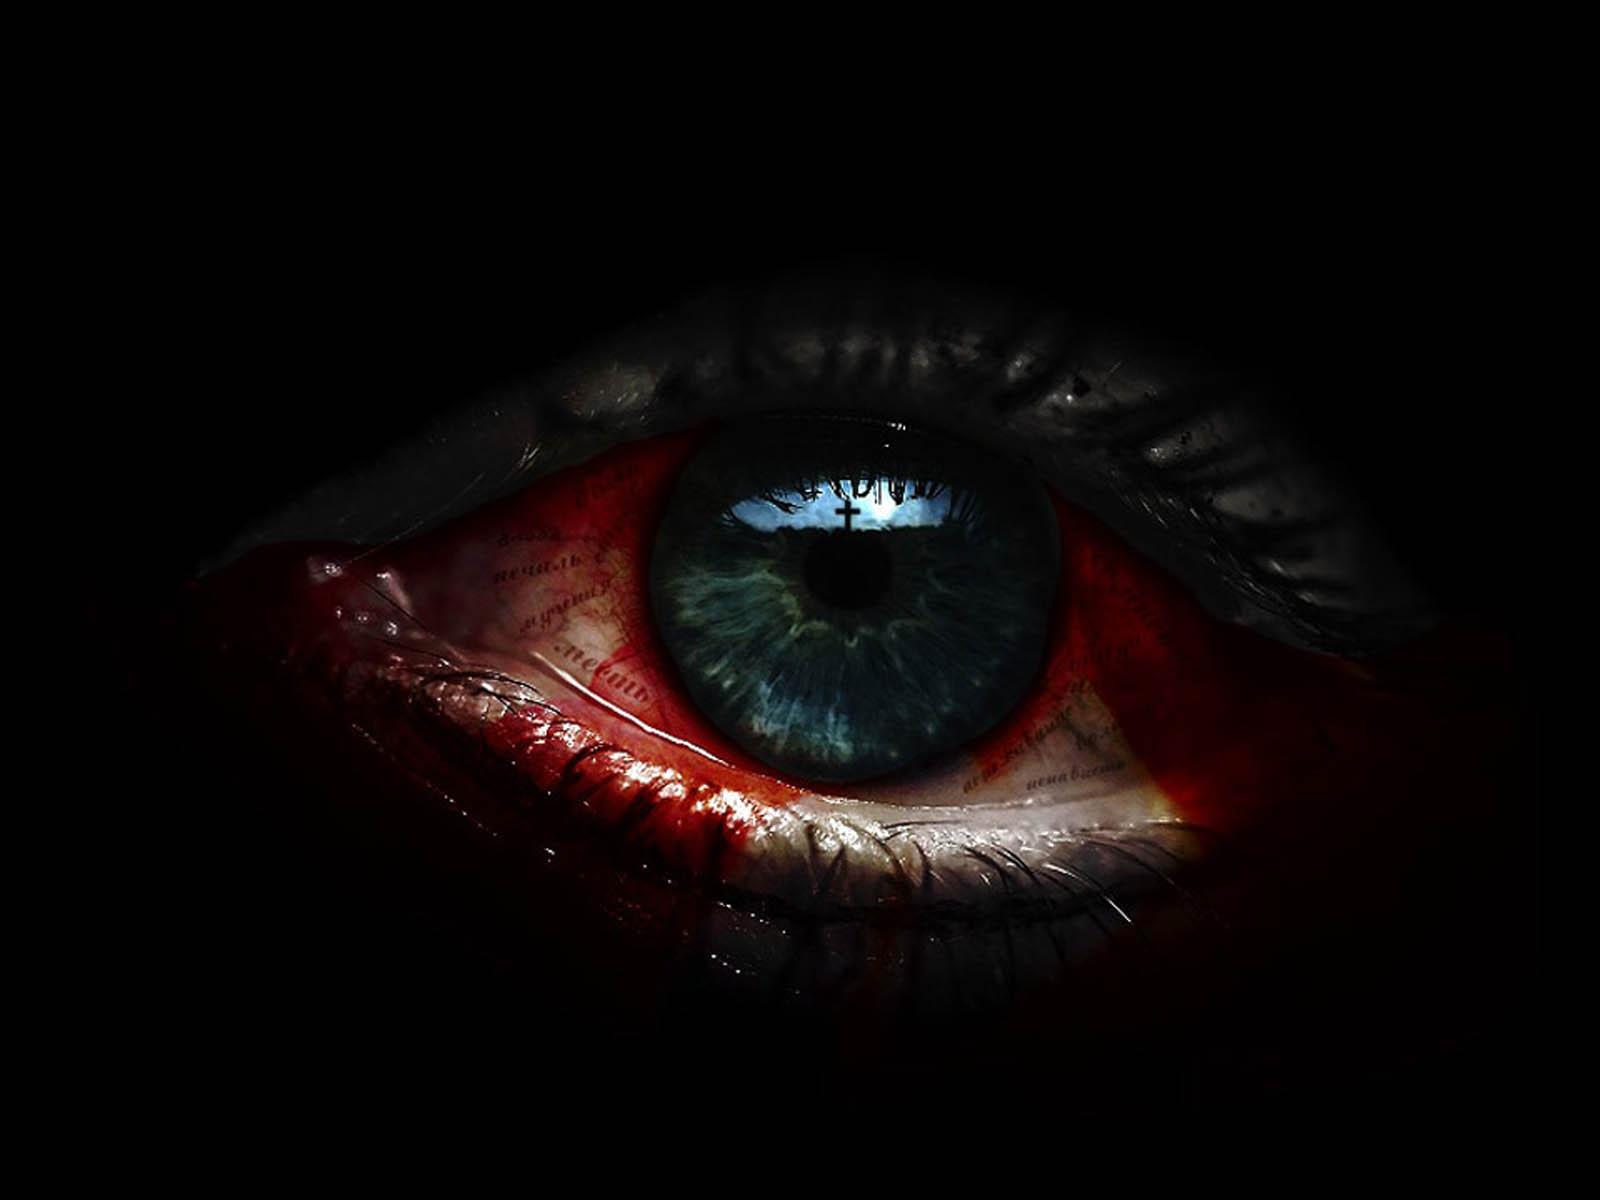 Keywords Horror Eye Wallpapers Horror Eye Desktop Wallpapers Horror 1600x1200